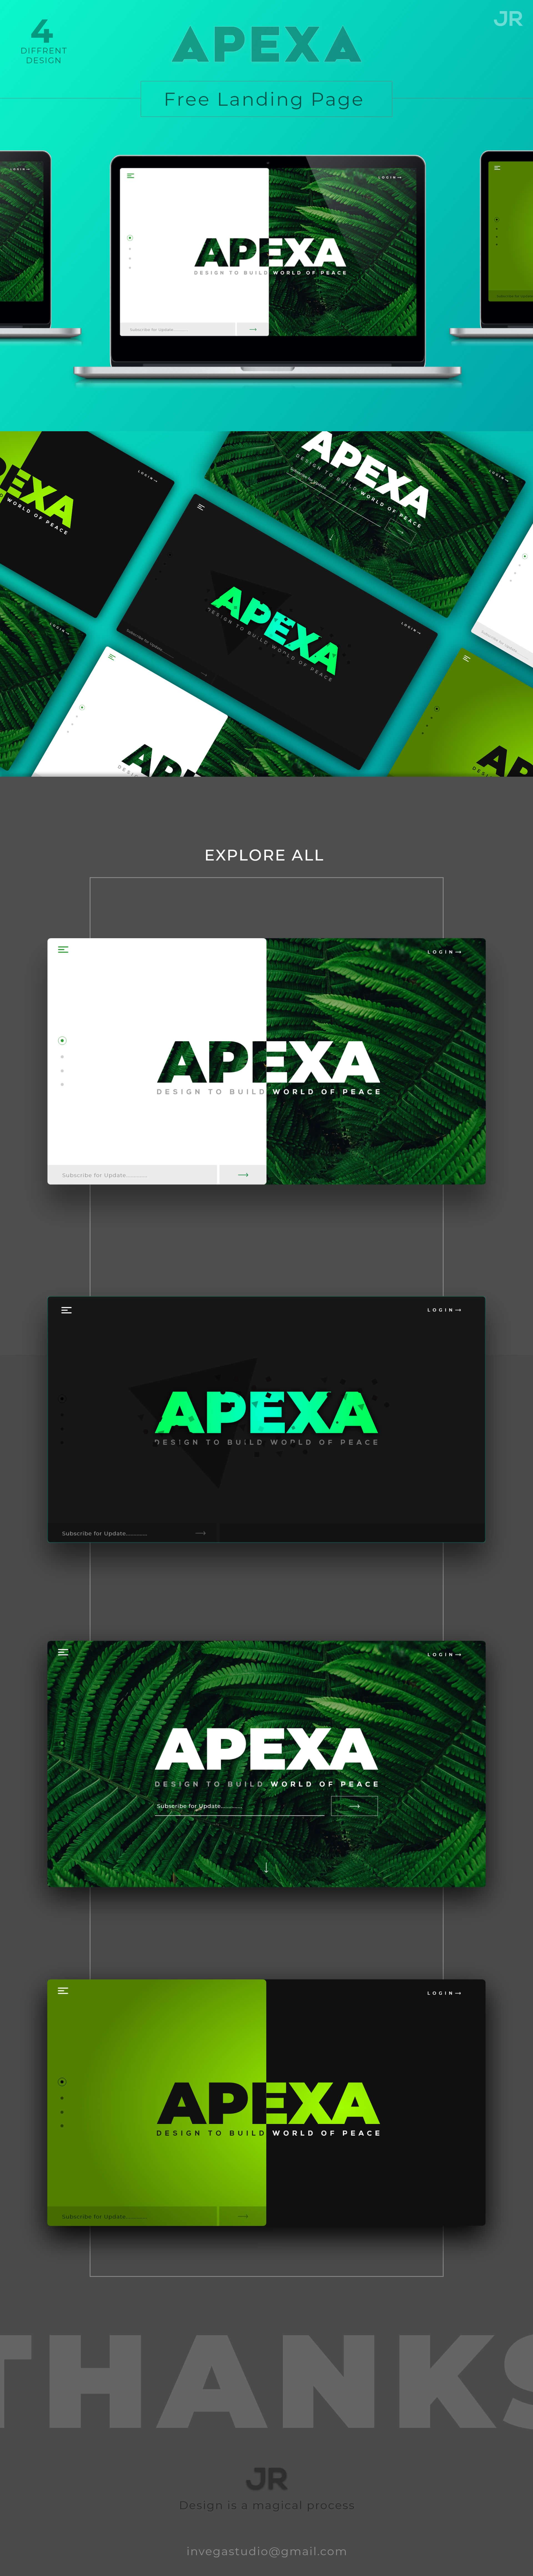 APEXA - Inspirations Landing page Design Template presentation image